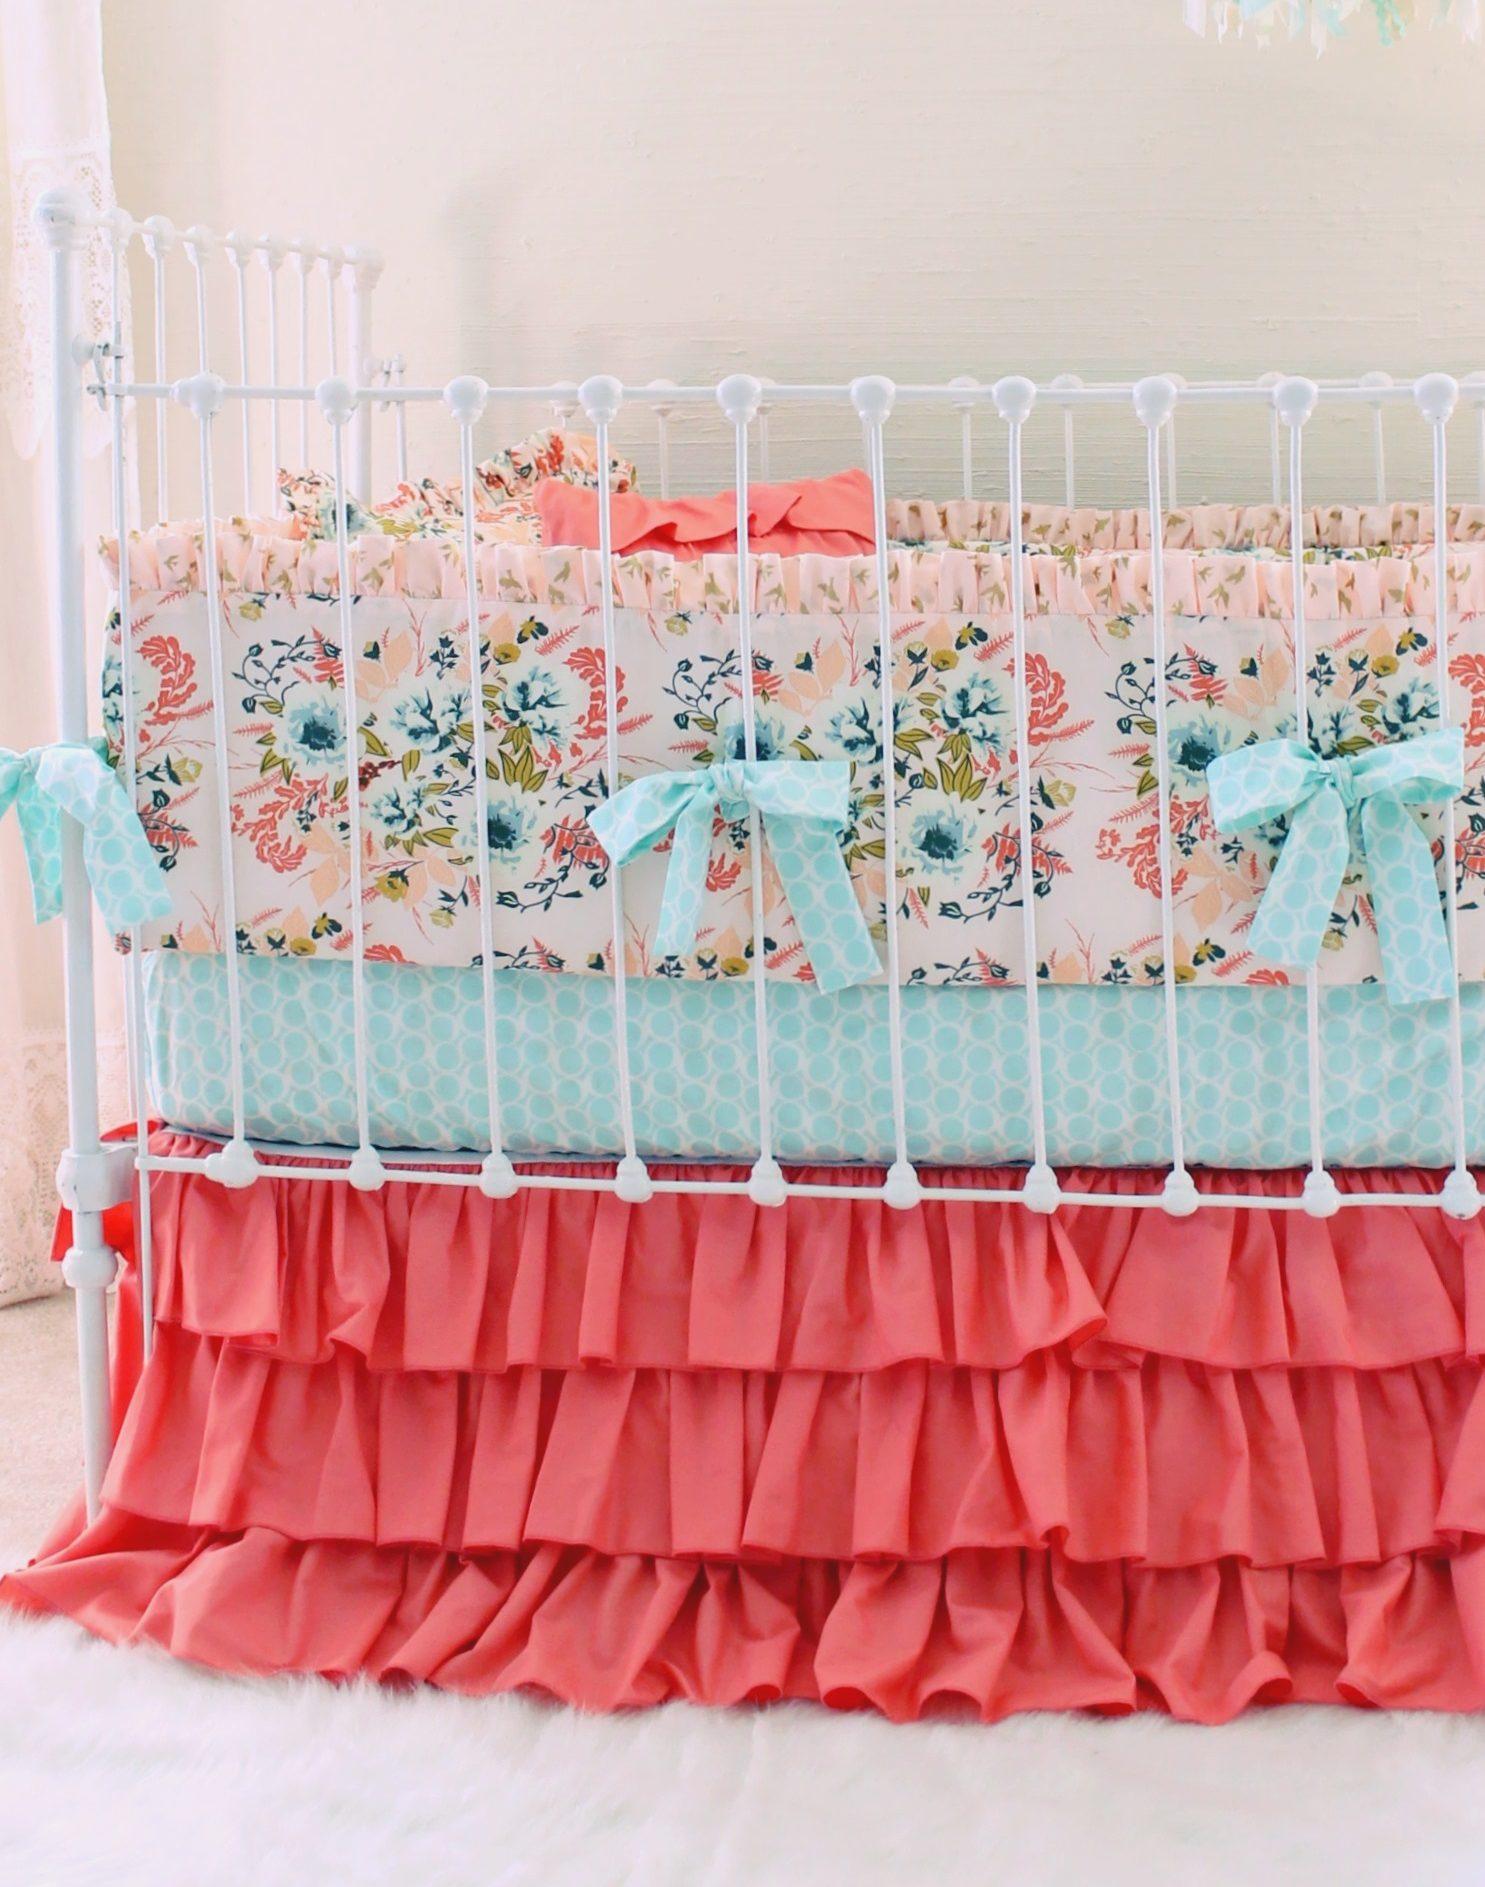 Blush Floral Baby Crib Bedding Set Farmhouse Chic